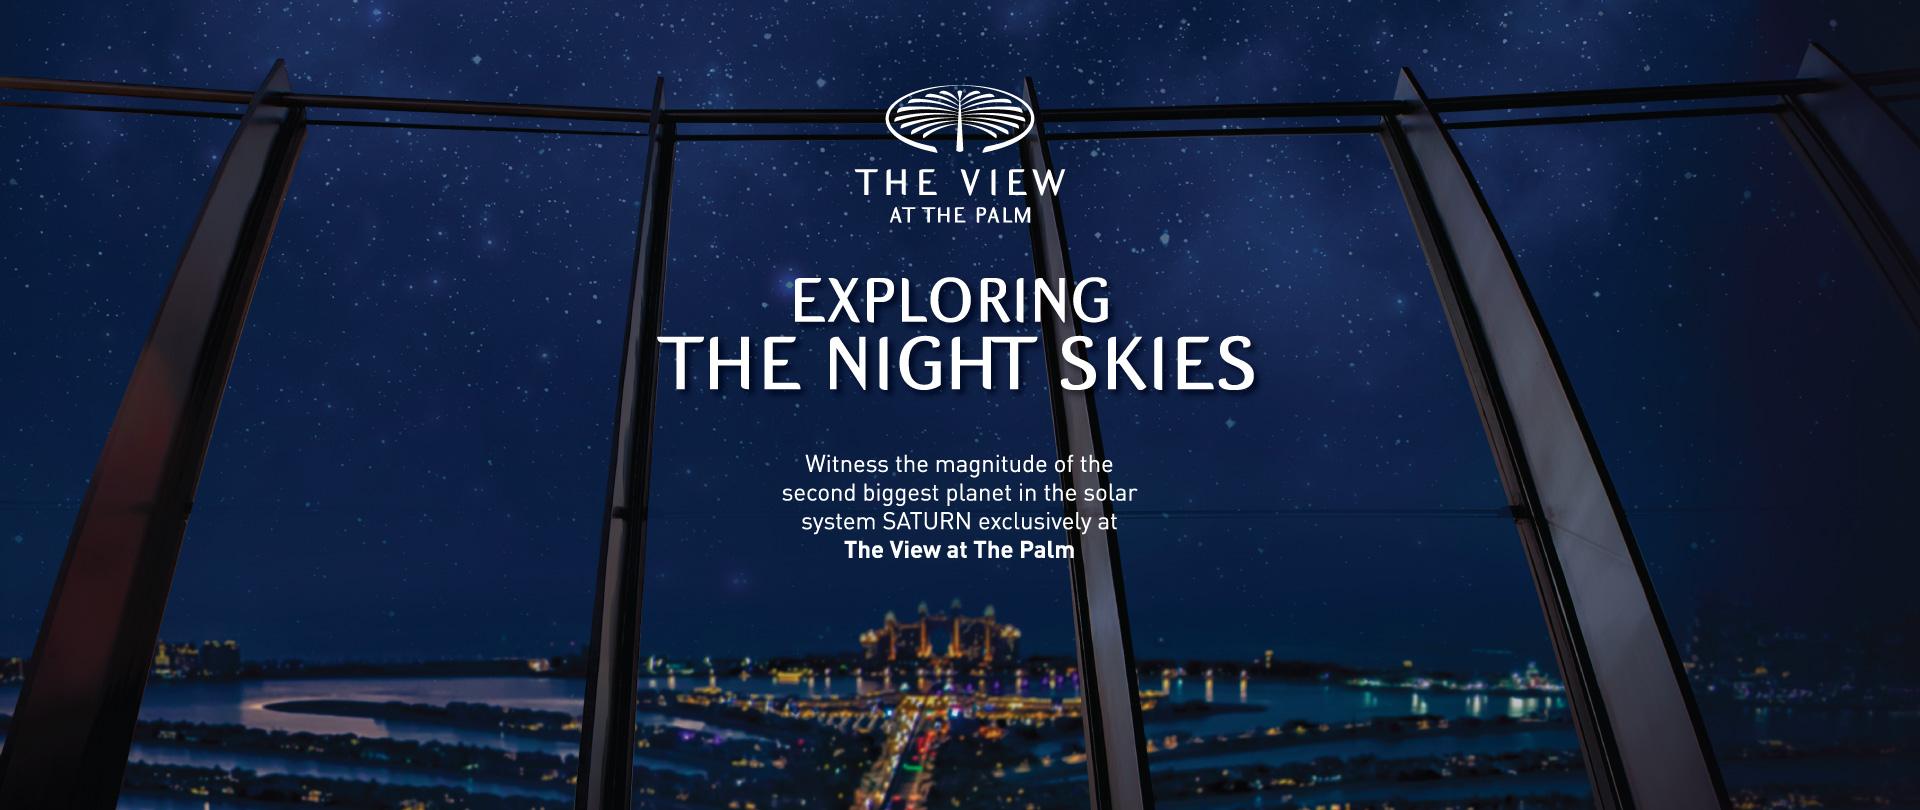 Exploring the Night Skies